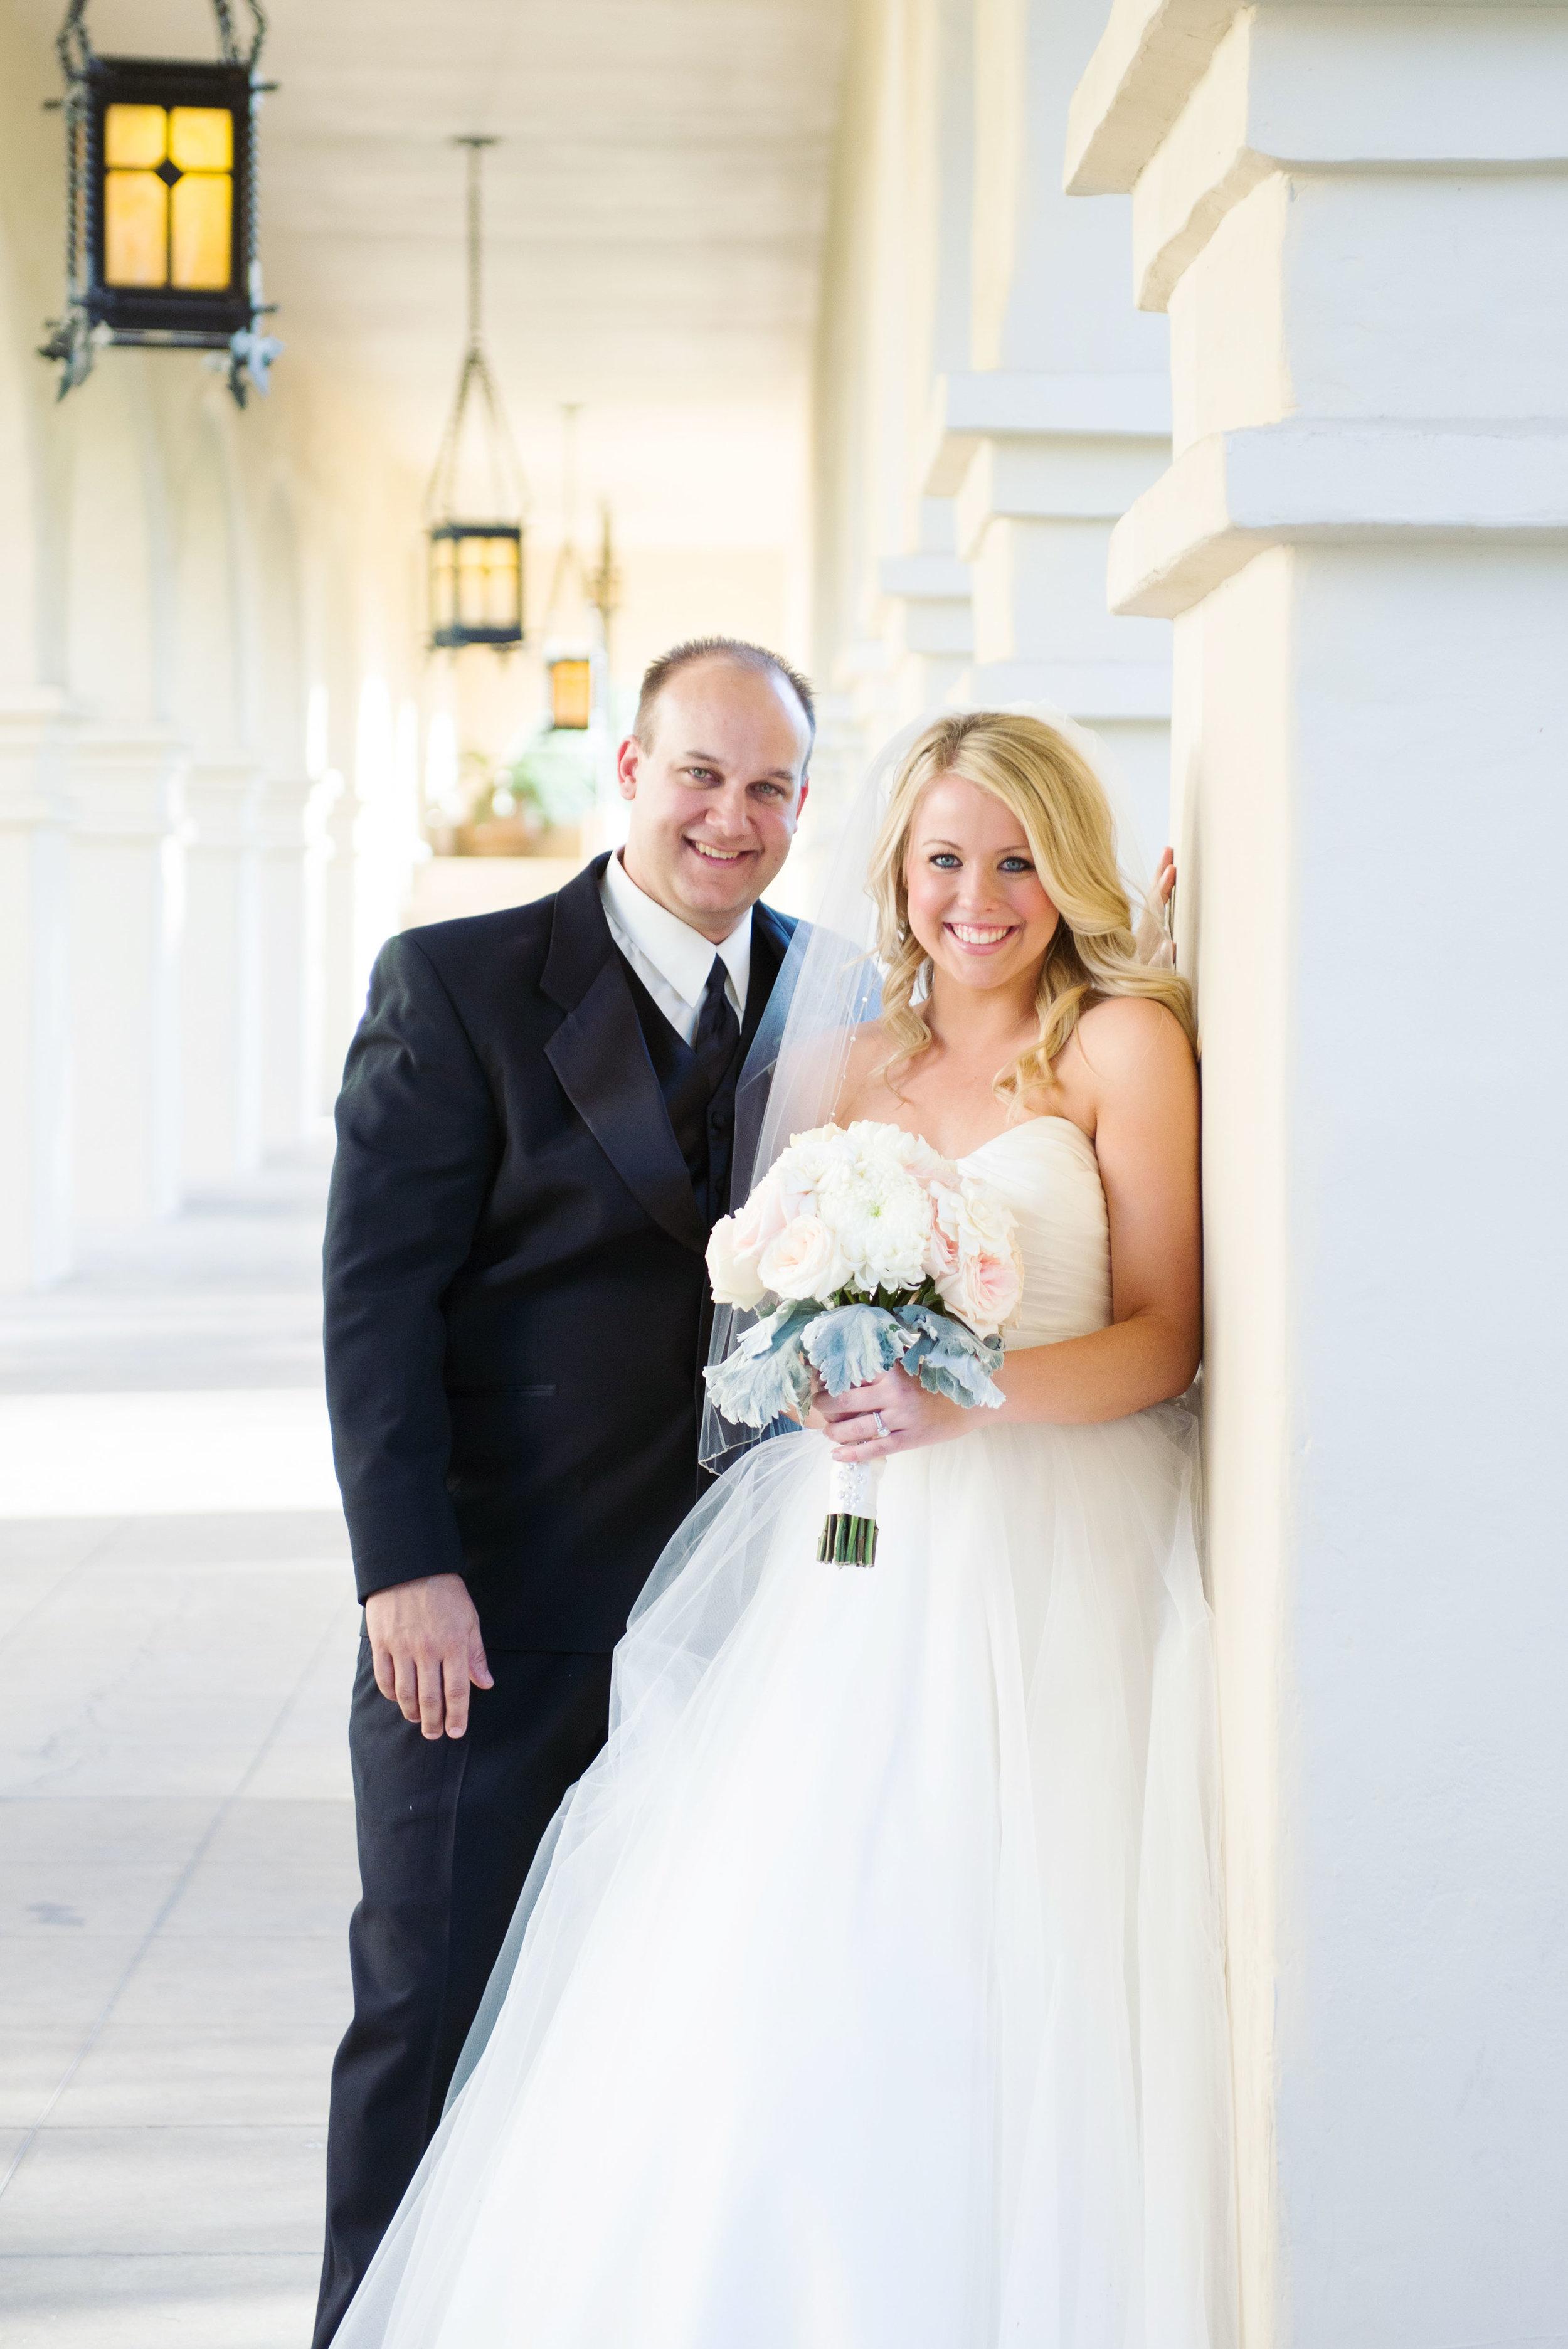 weddingwebsitesmallerpics-56.jpg